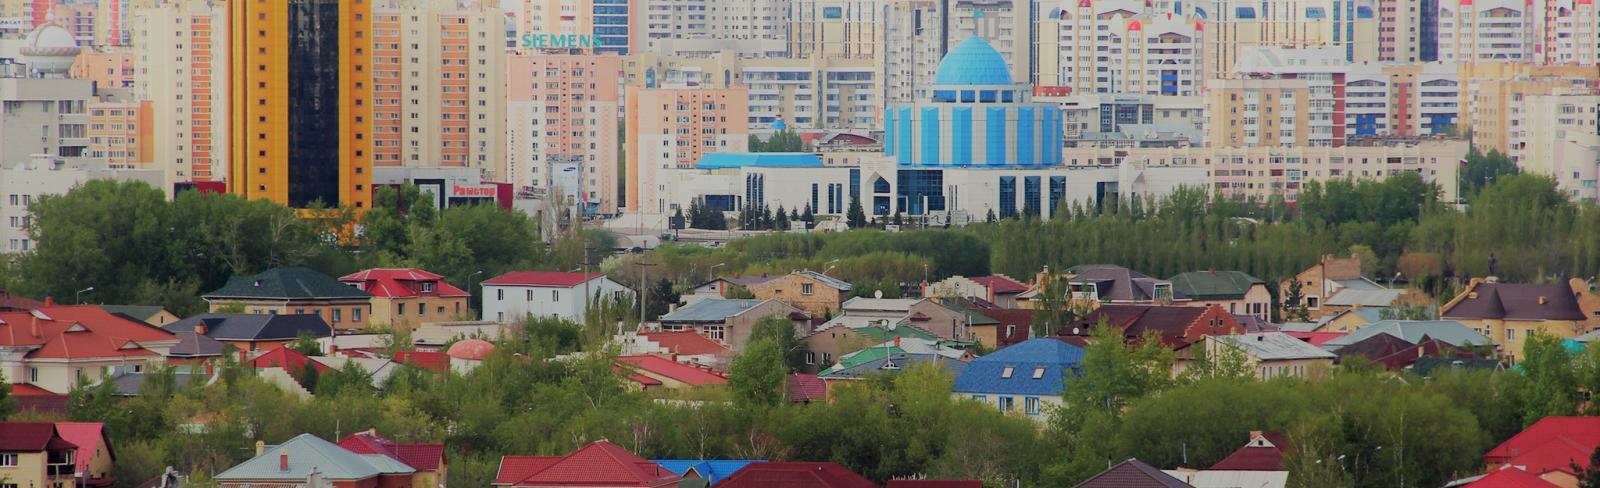 A view of homes outside of an urban area. Kazakhstan. Photo: Shynar Jetpissova / World Bank